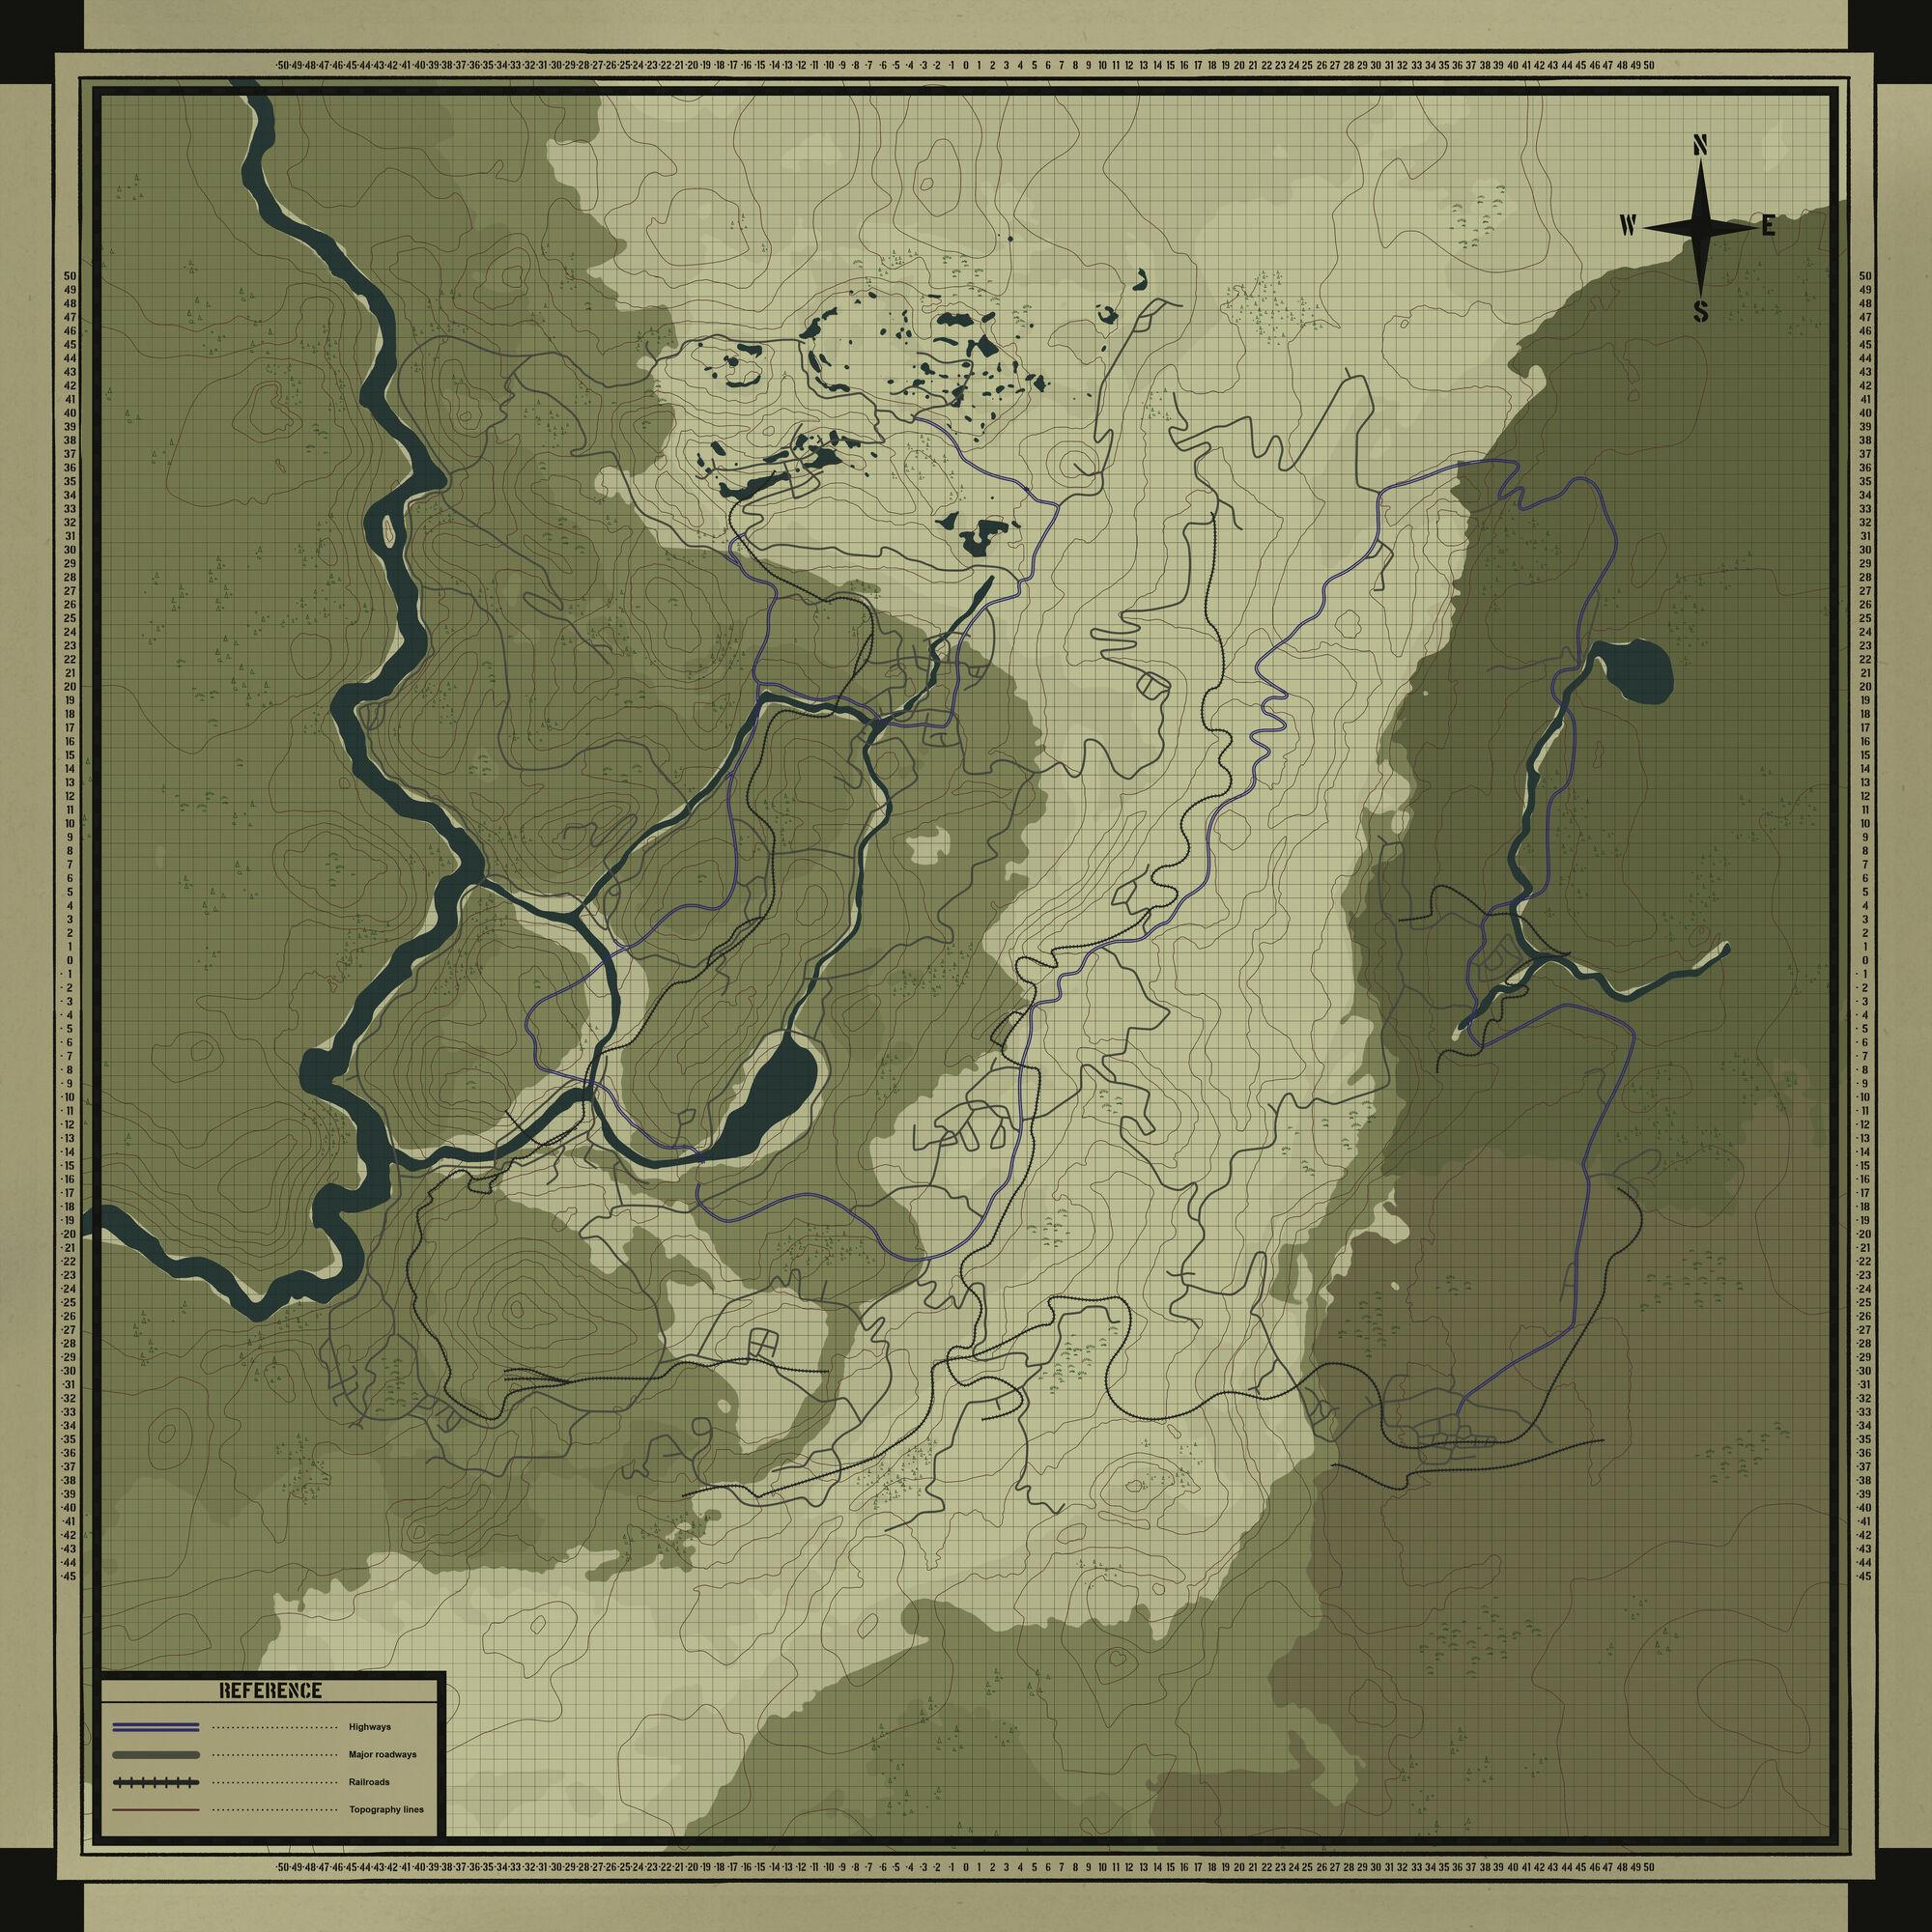 Fallout 76 Karte Deutsch.Fallout 76 Map Fallout Wiki Fandom Powered By Wikia